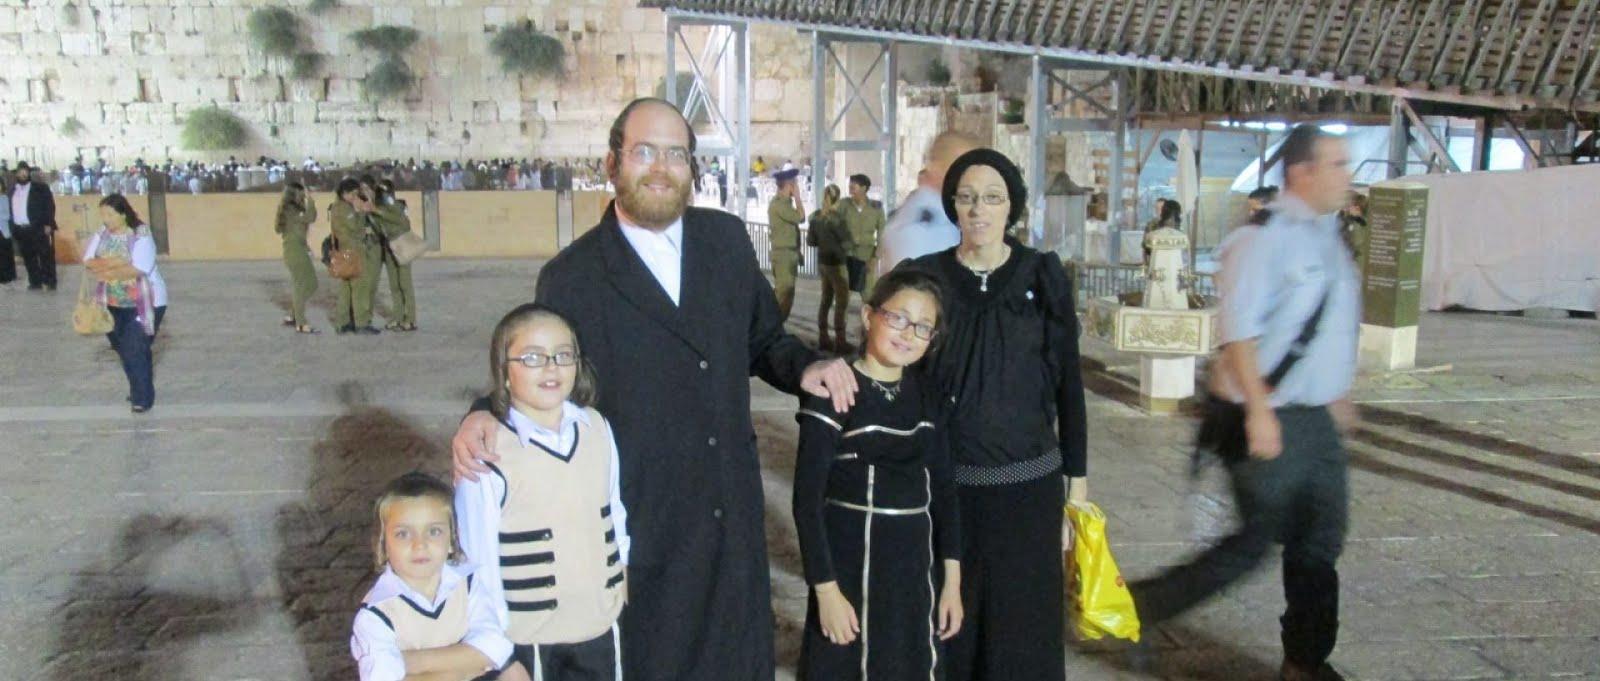 Shemesh Word: DUS IZ NIES !!: Entire Prominent Beit Shemesh Family Goes